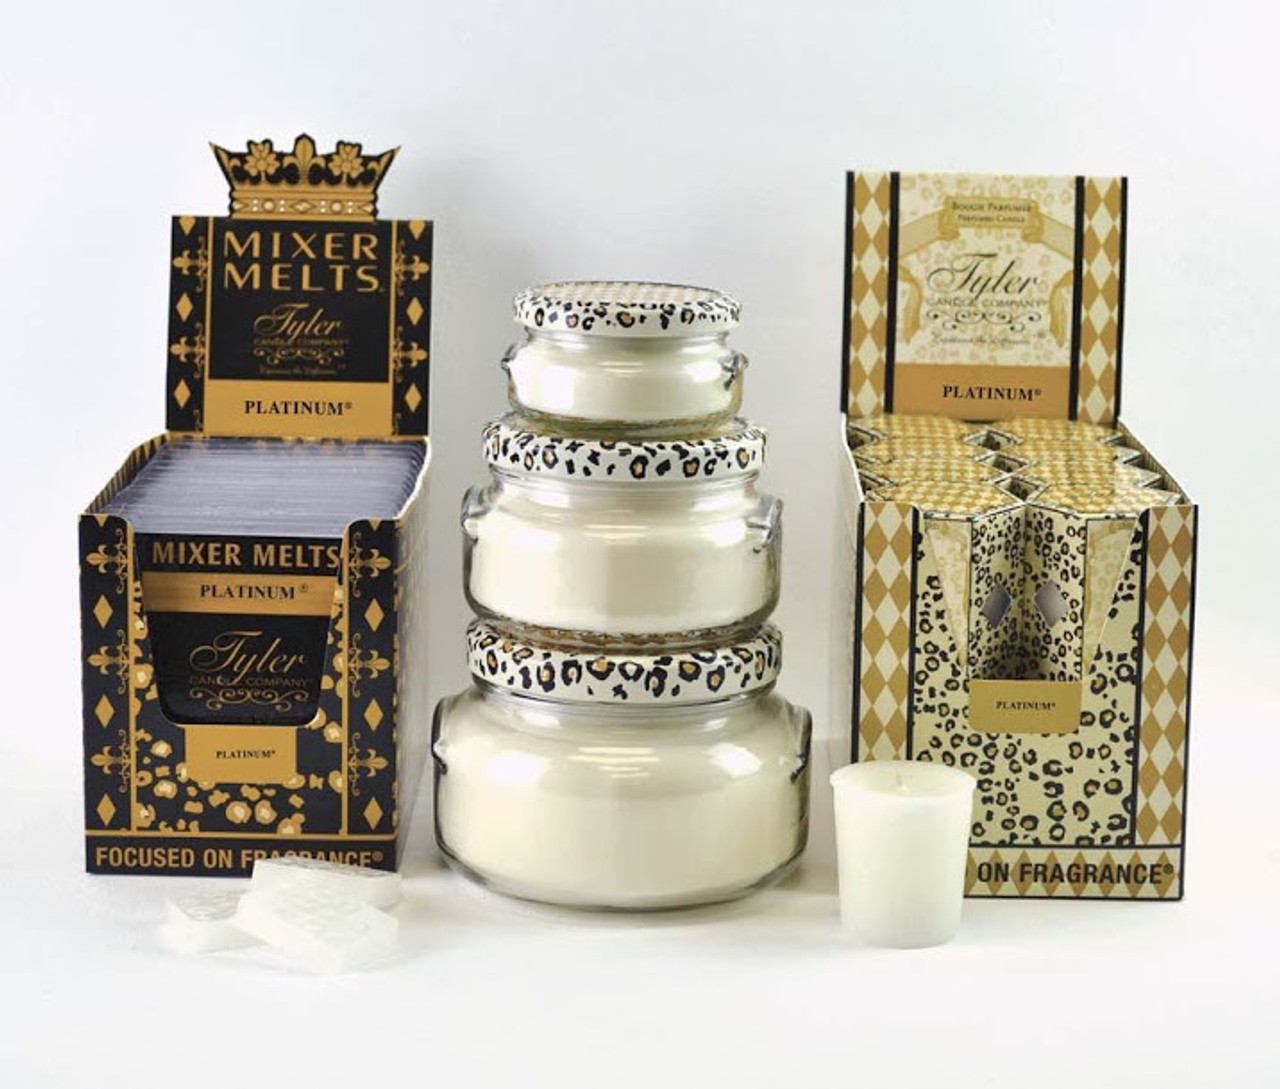 3.4 oz Platinum Candle Tyler Candle Company